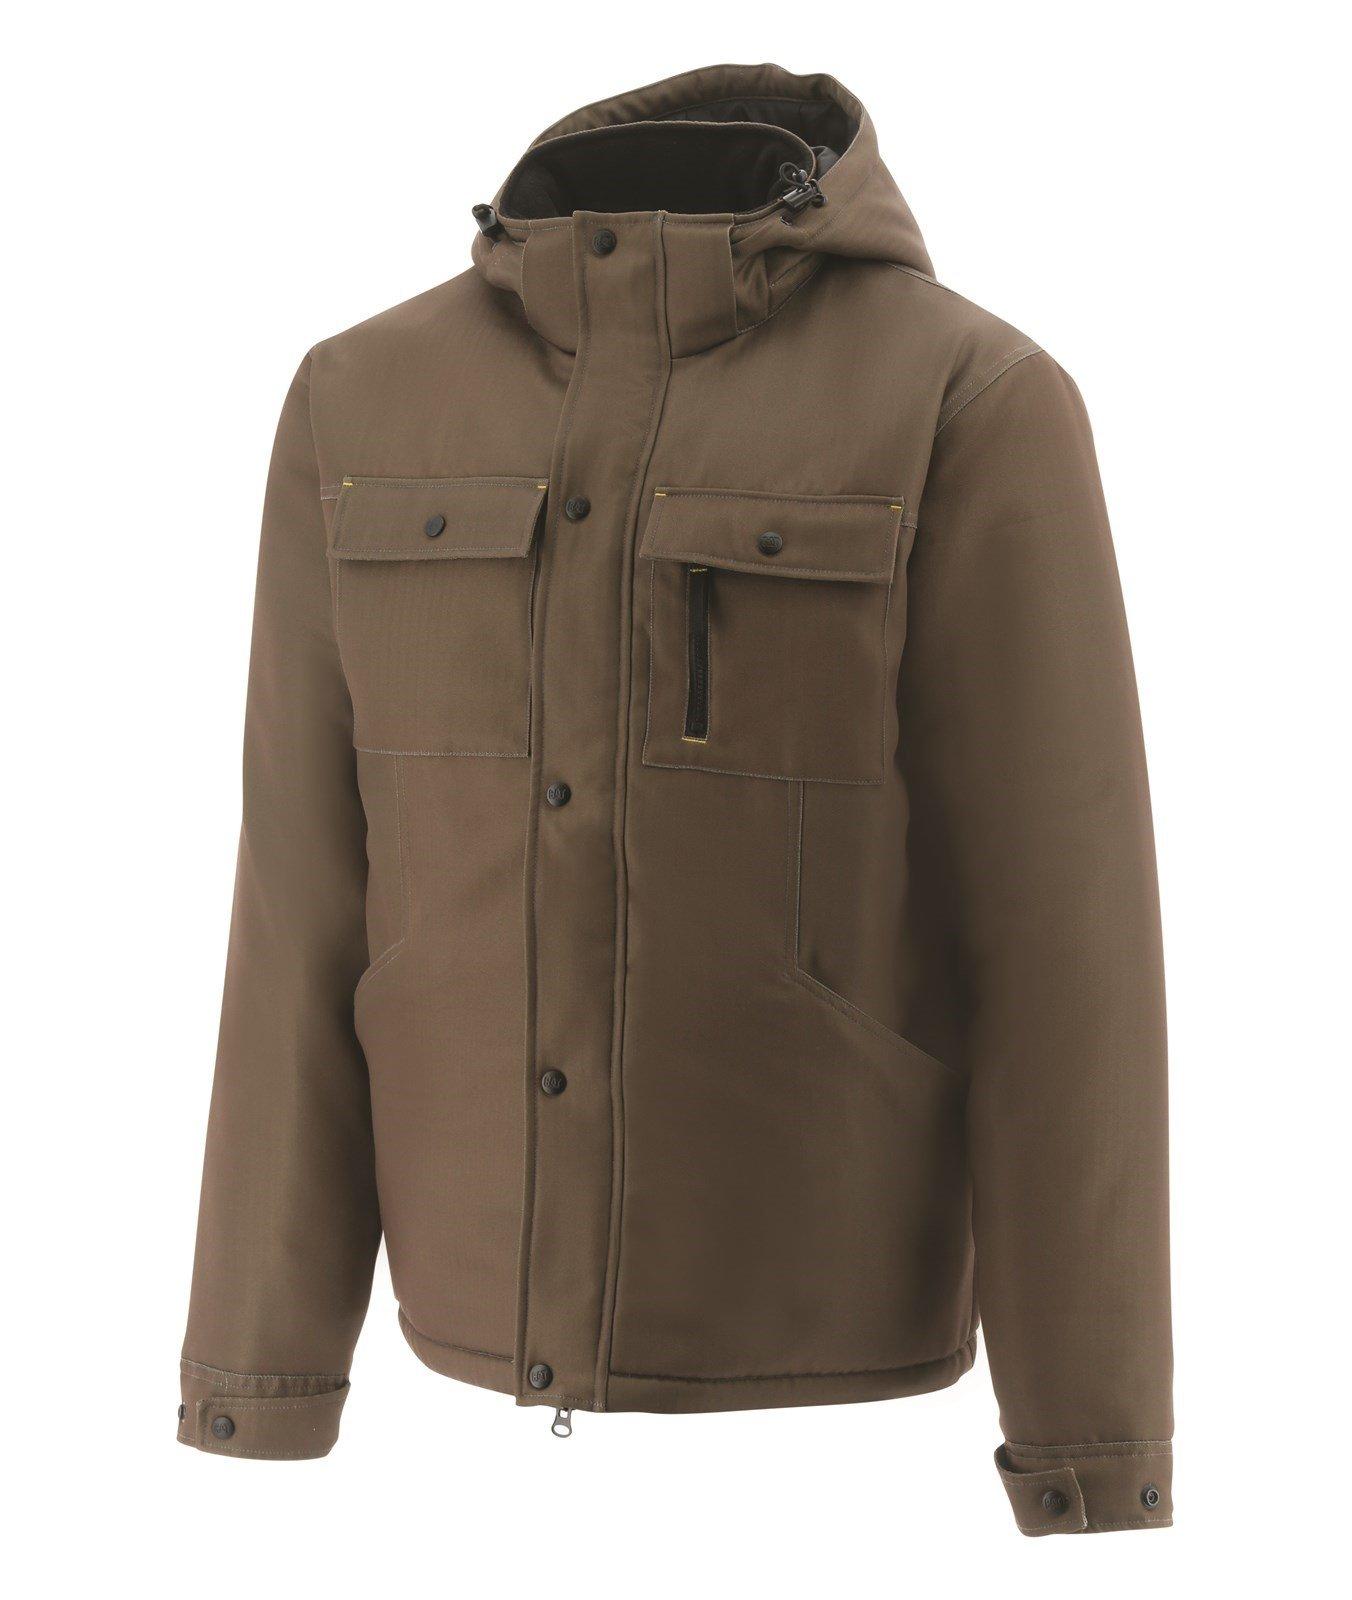 Caterpillar Unisex Stealth Insulated Workwear Jacket Black 31677 - Buffalo Sml